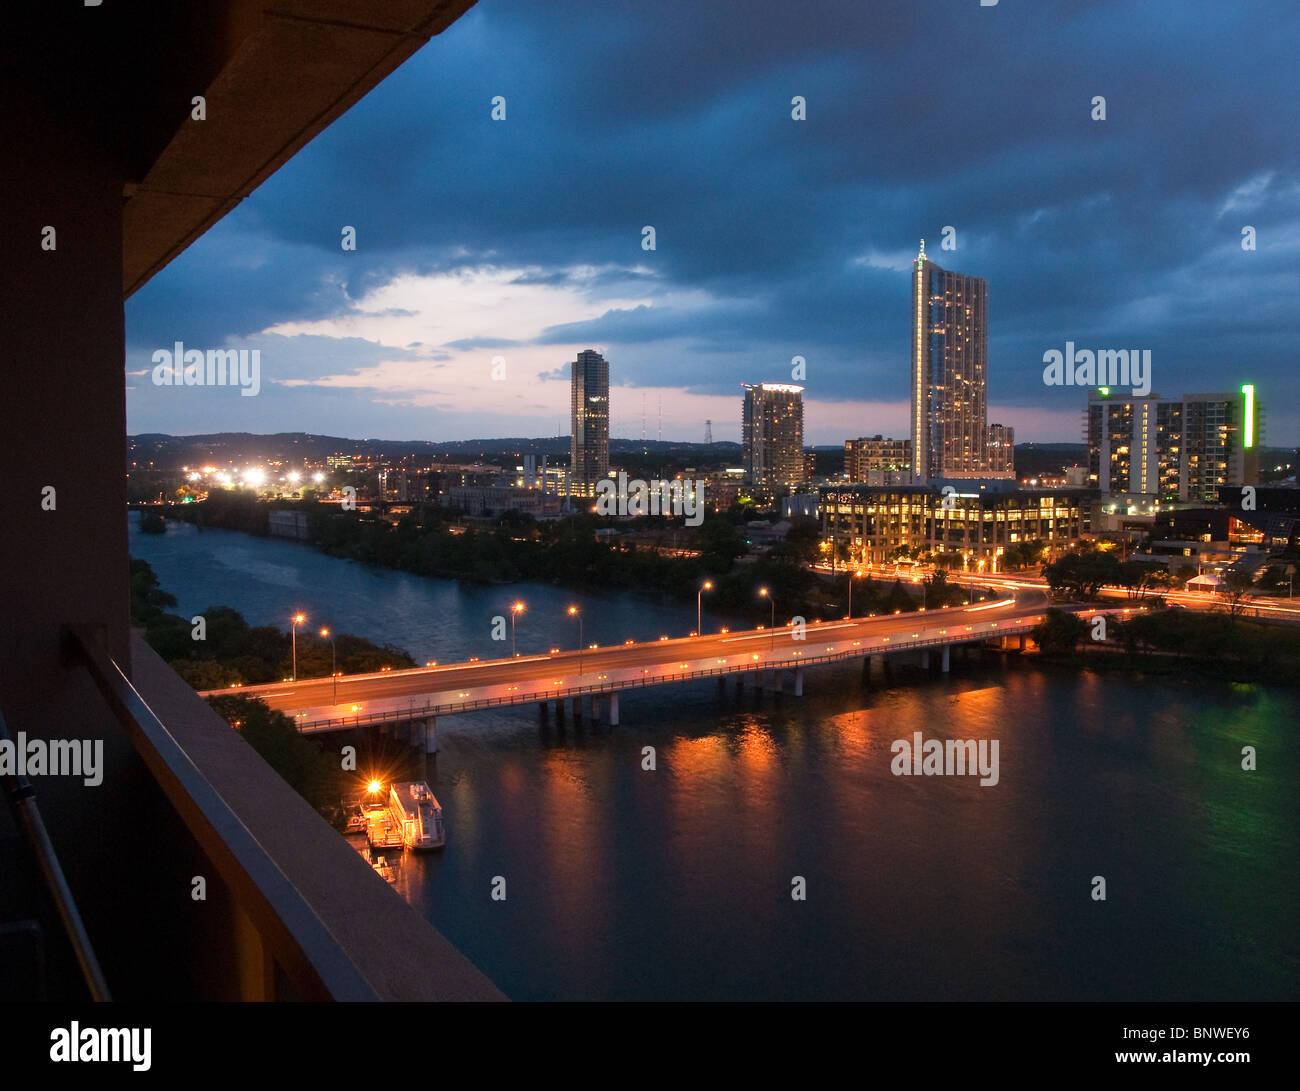 City skyline at night of Austin, Texas, USA Stock Photo